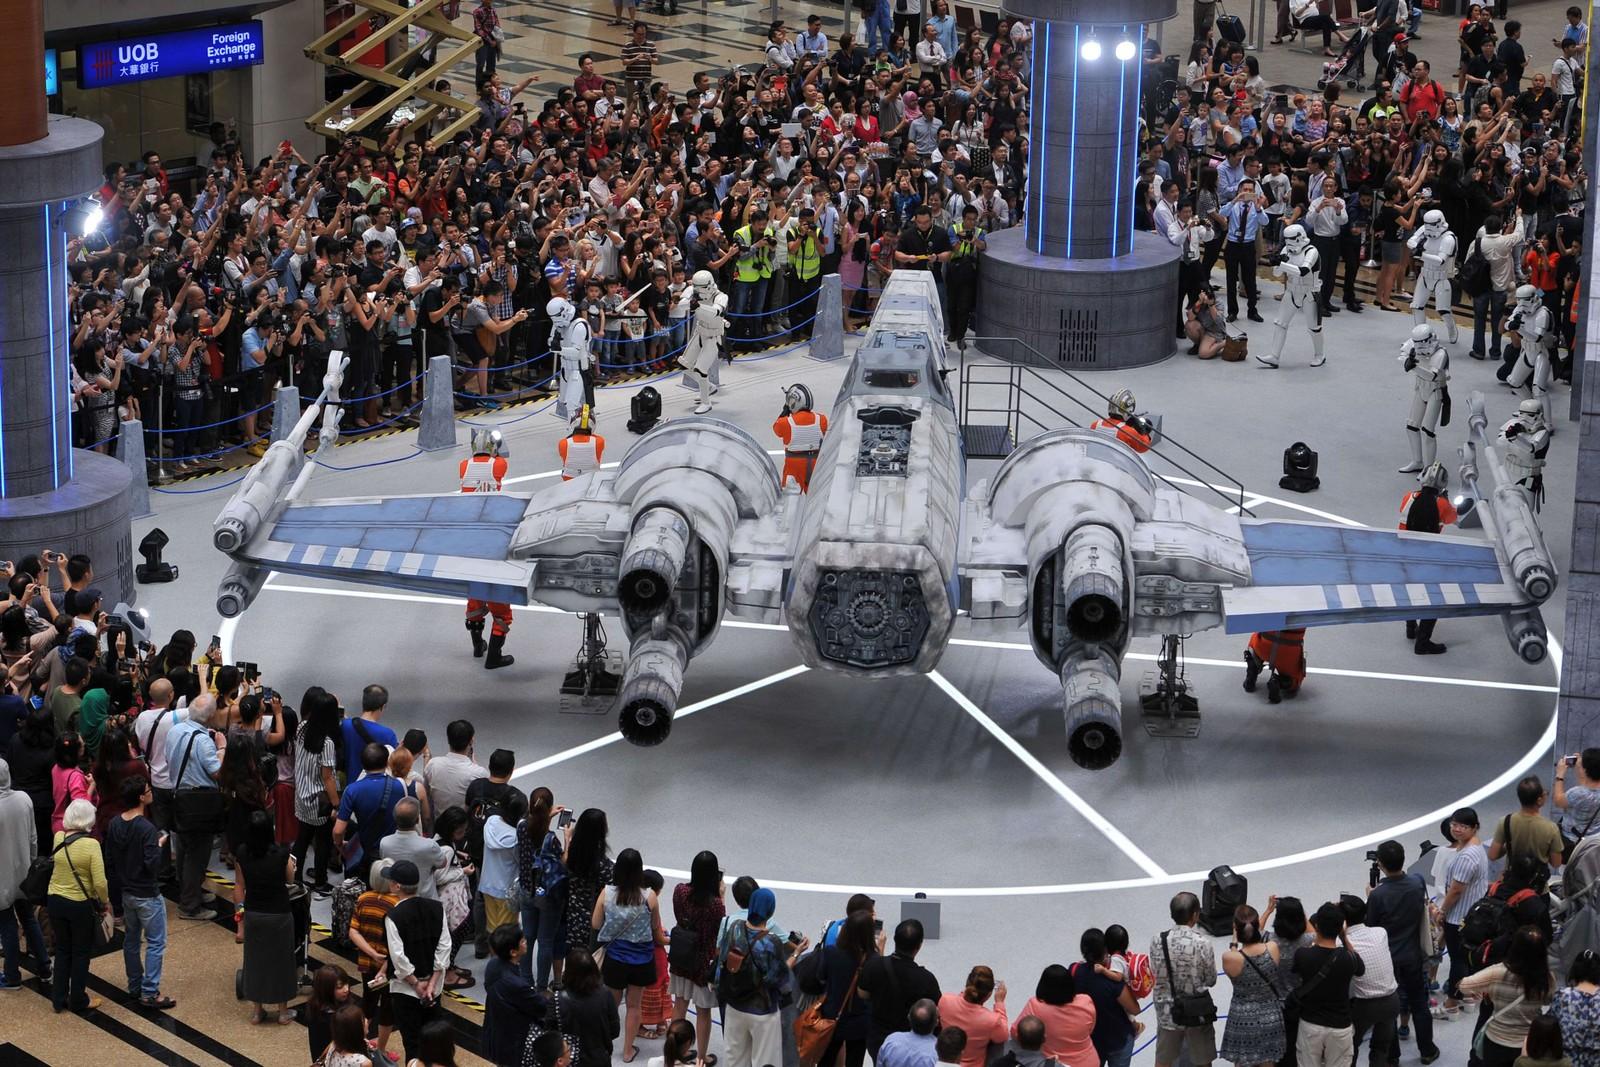 Store og små Star Wars-fans bivåner et X-Wing-fartøy i faktisk størrelse under et arrangement på Changi-flyplassen i Singapore.